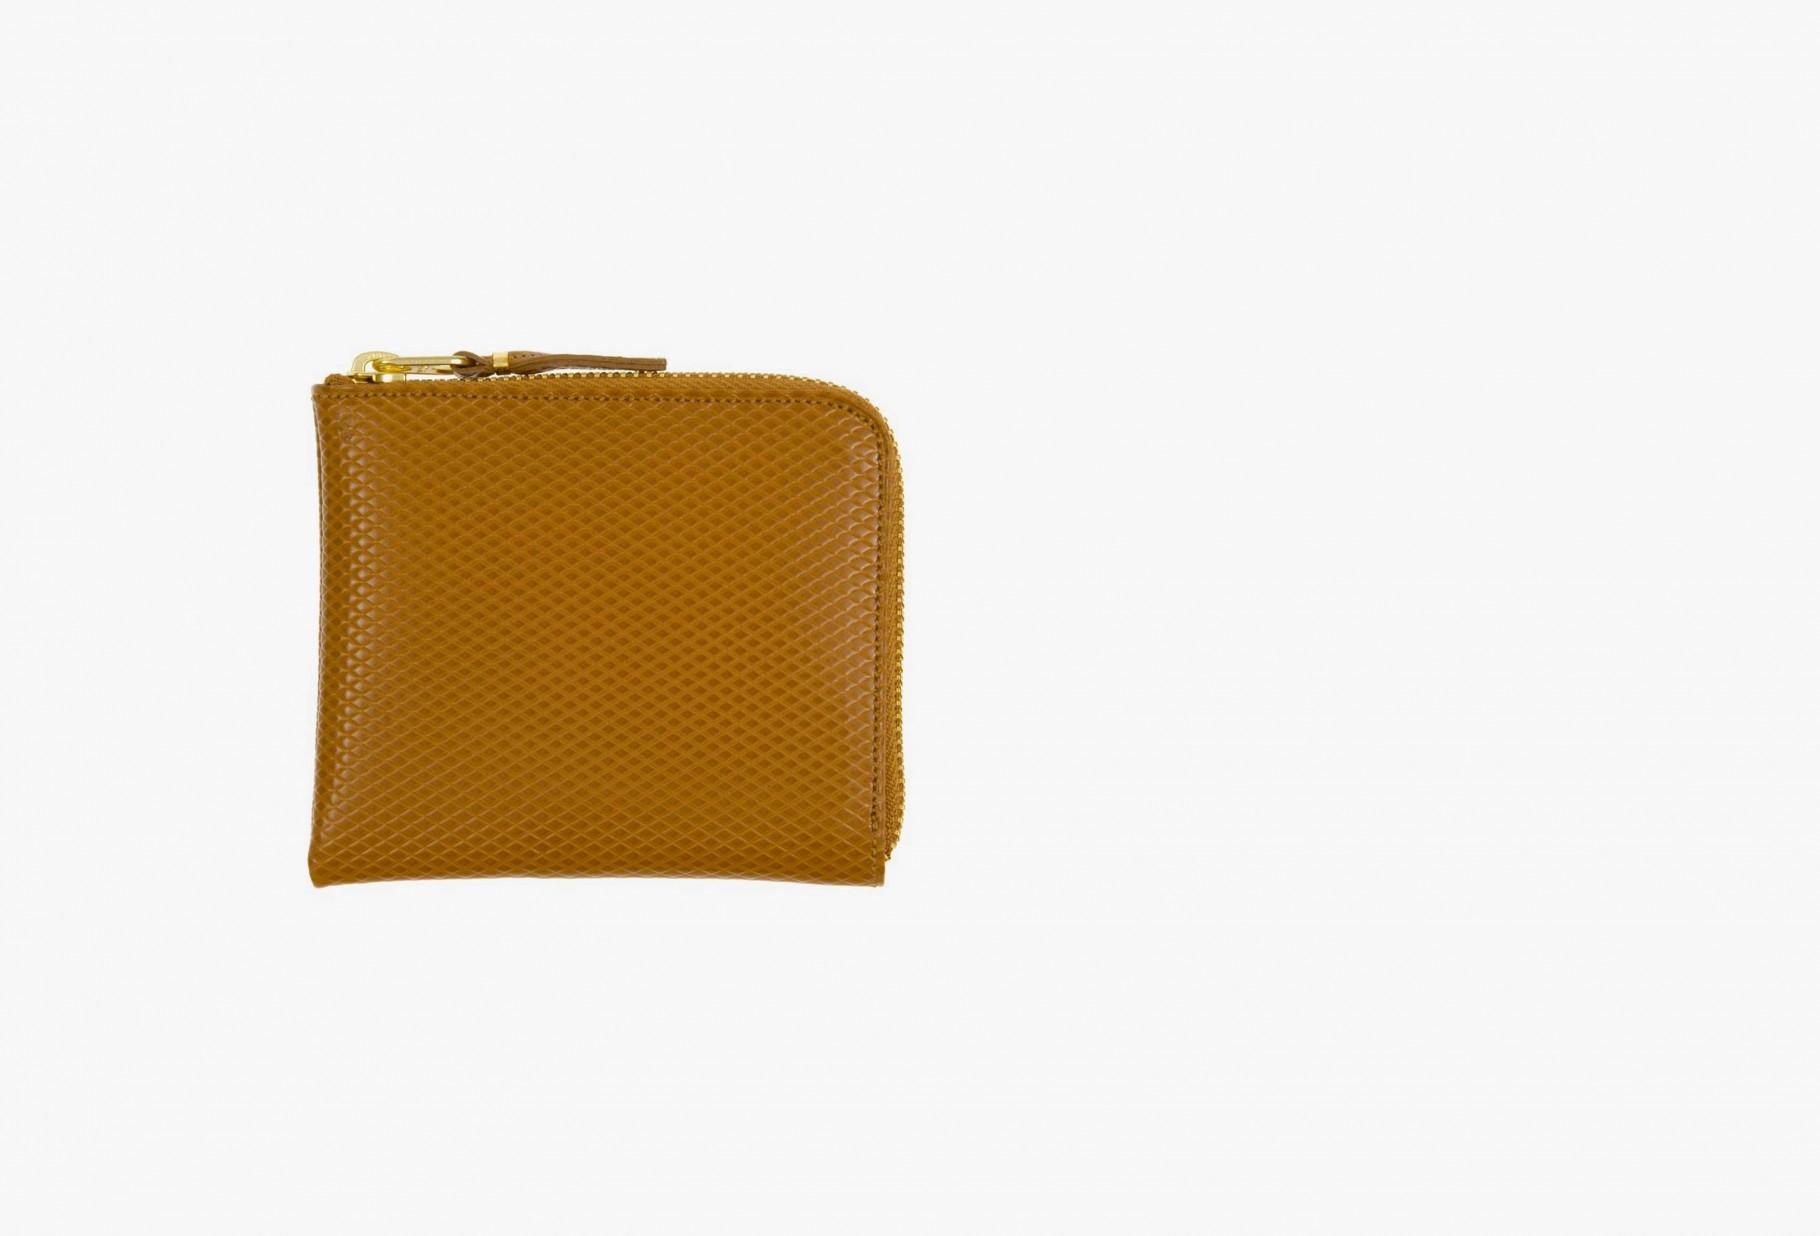 CDG WALLETS / Cdg luxury group 3100lg Beige